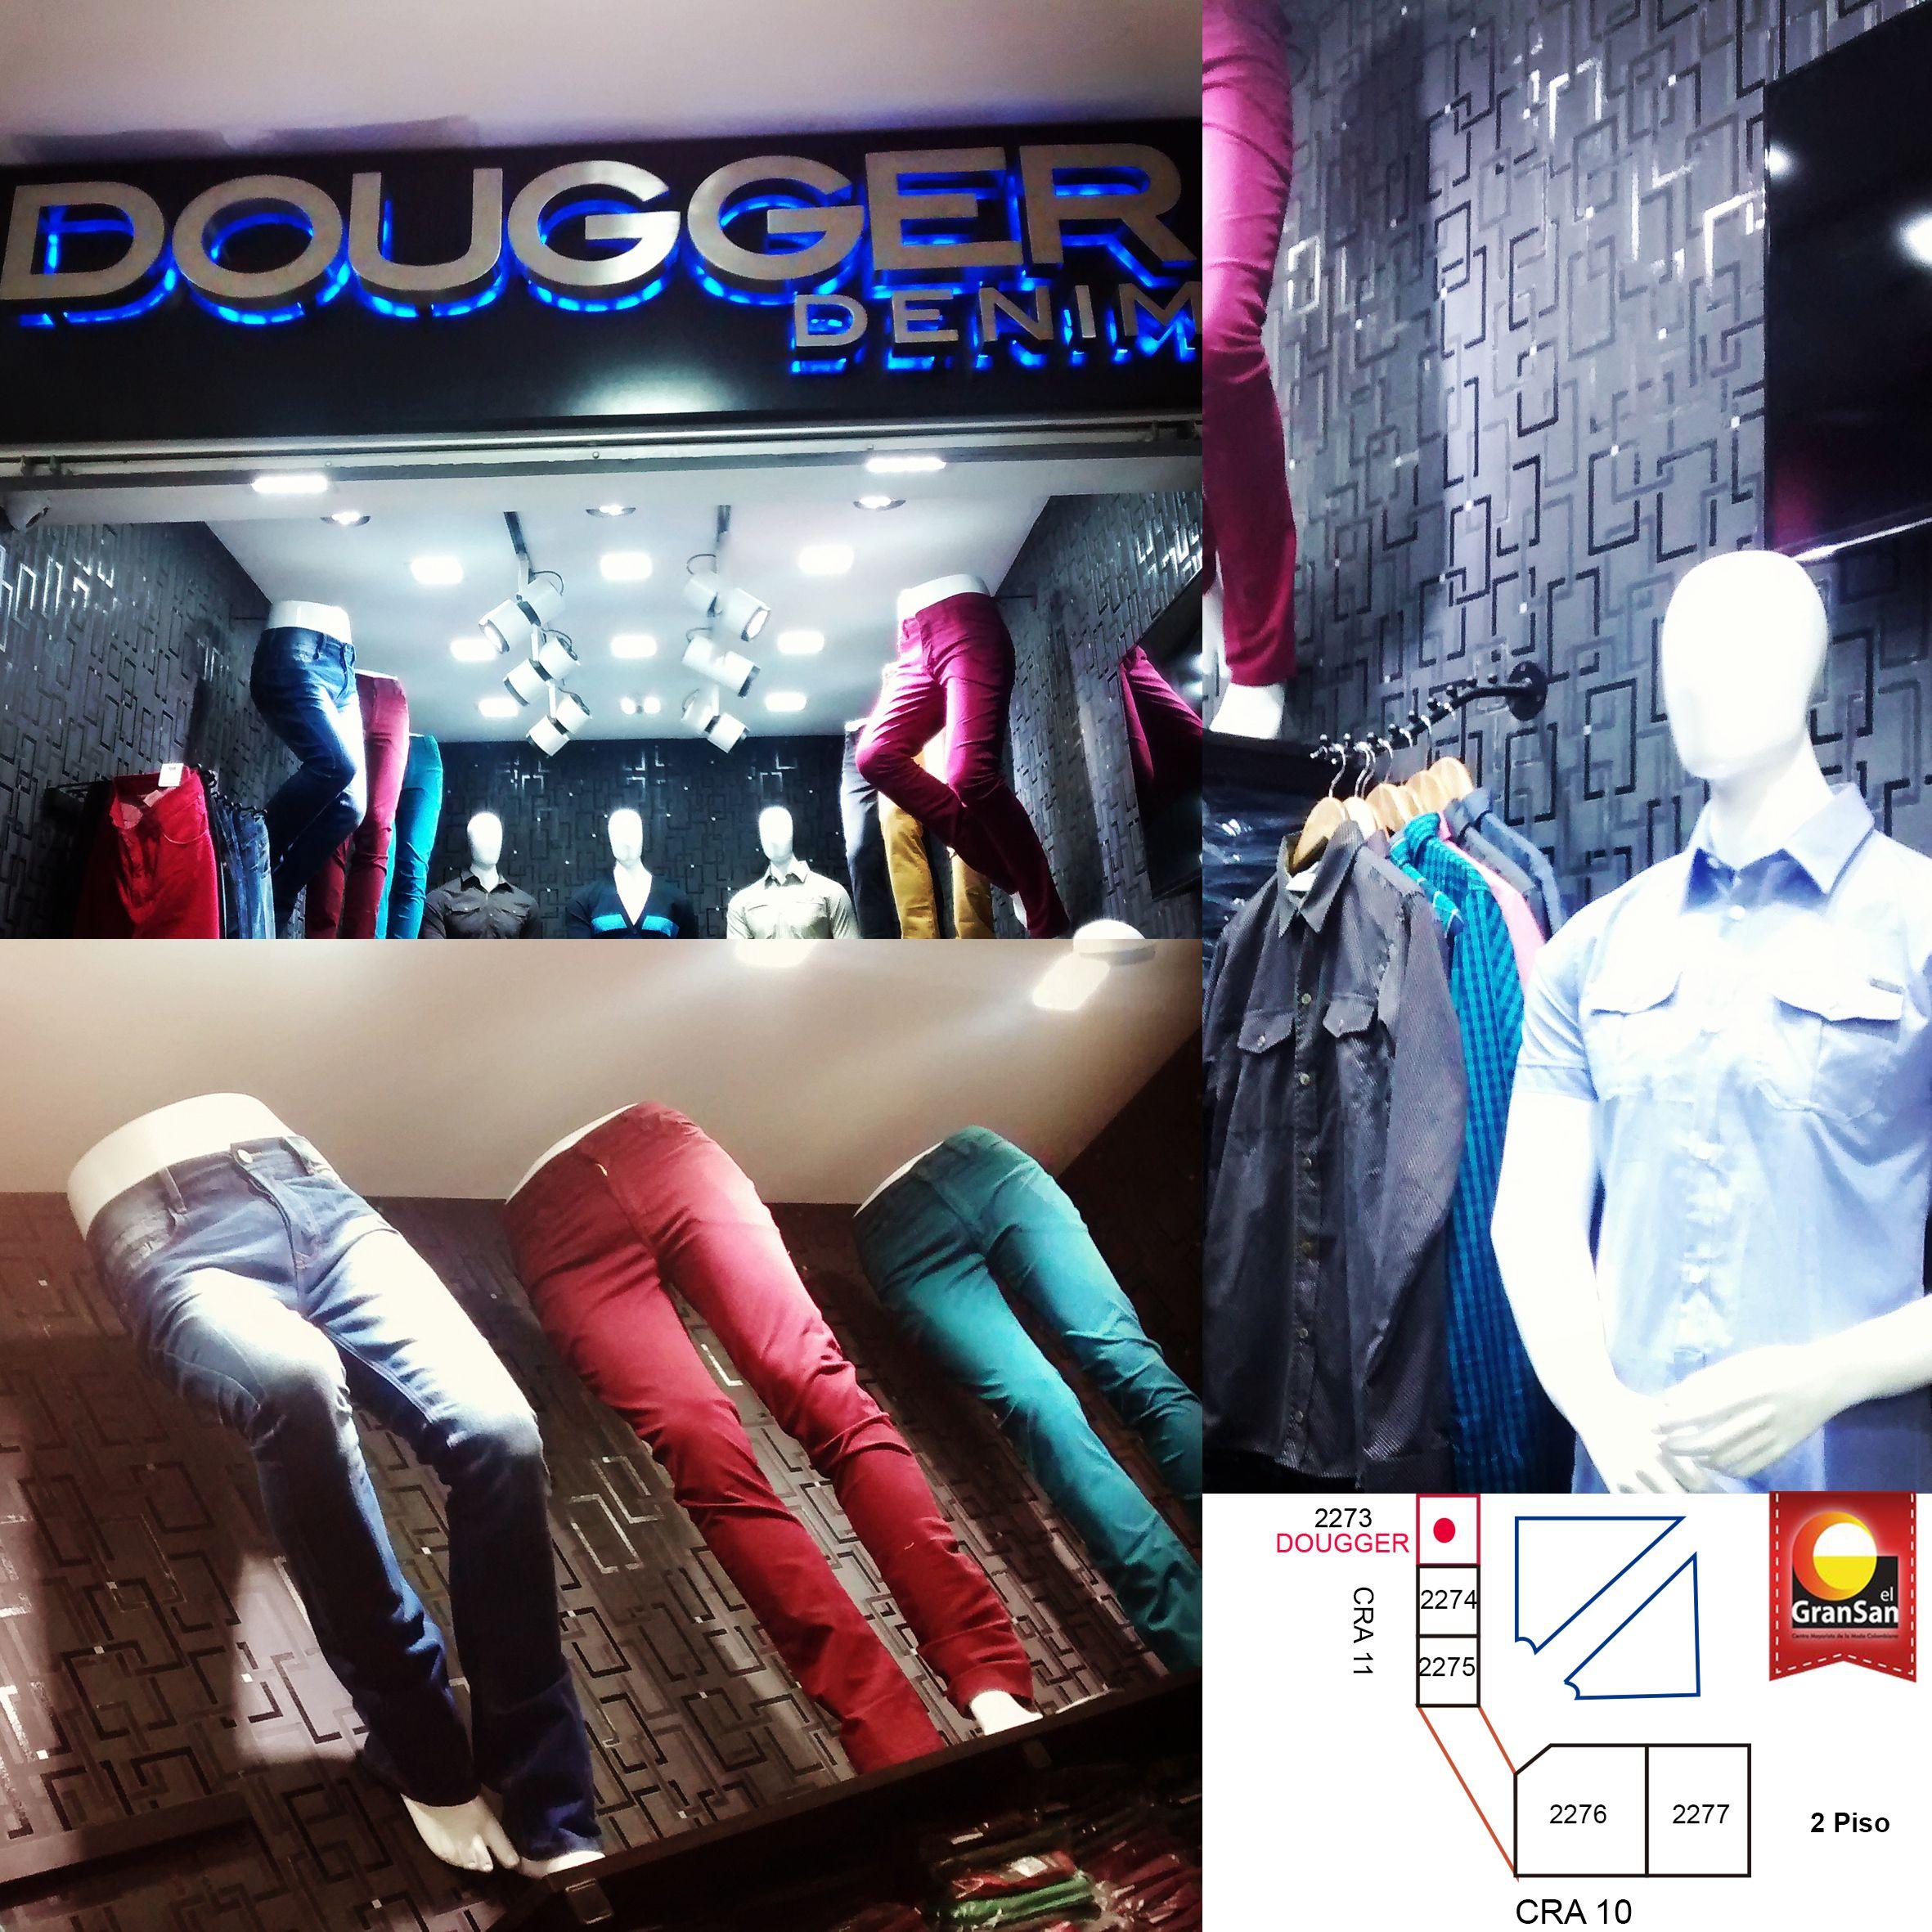 MarcadelDía DOUGGER. Pantalones 7f37967764c5